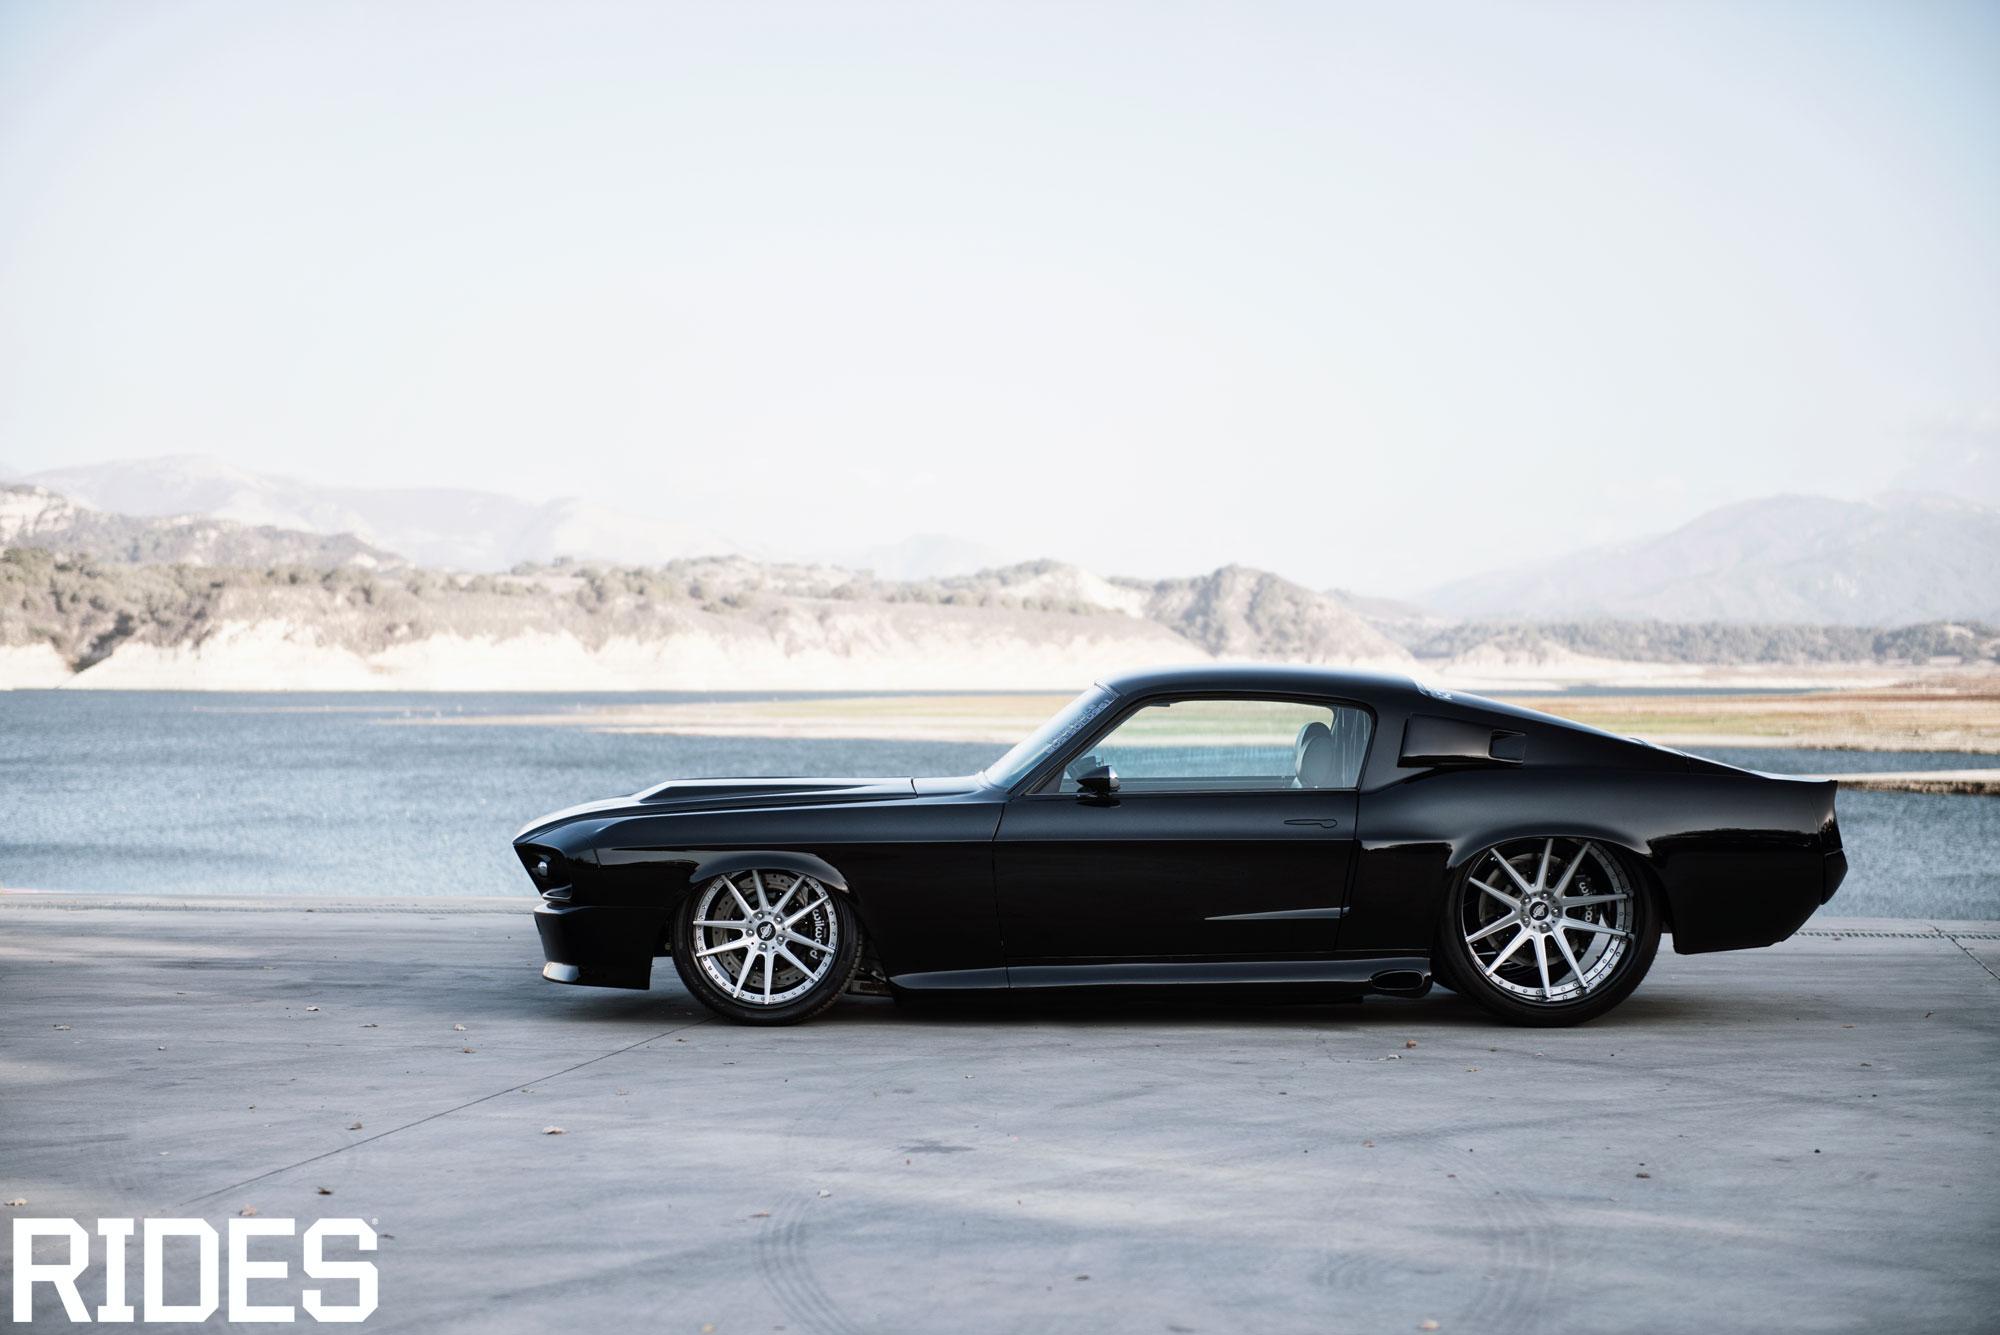 Best Looking American Cars Ever